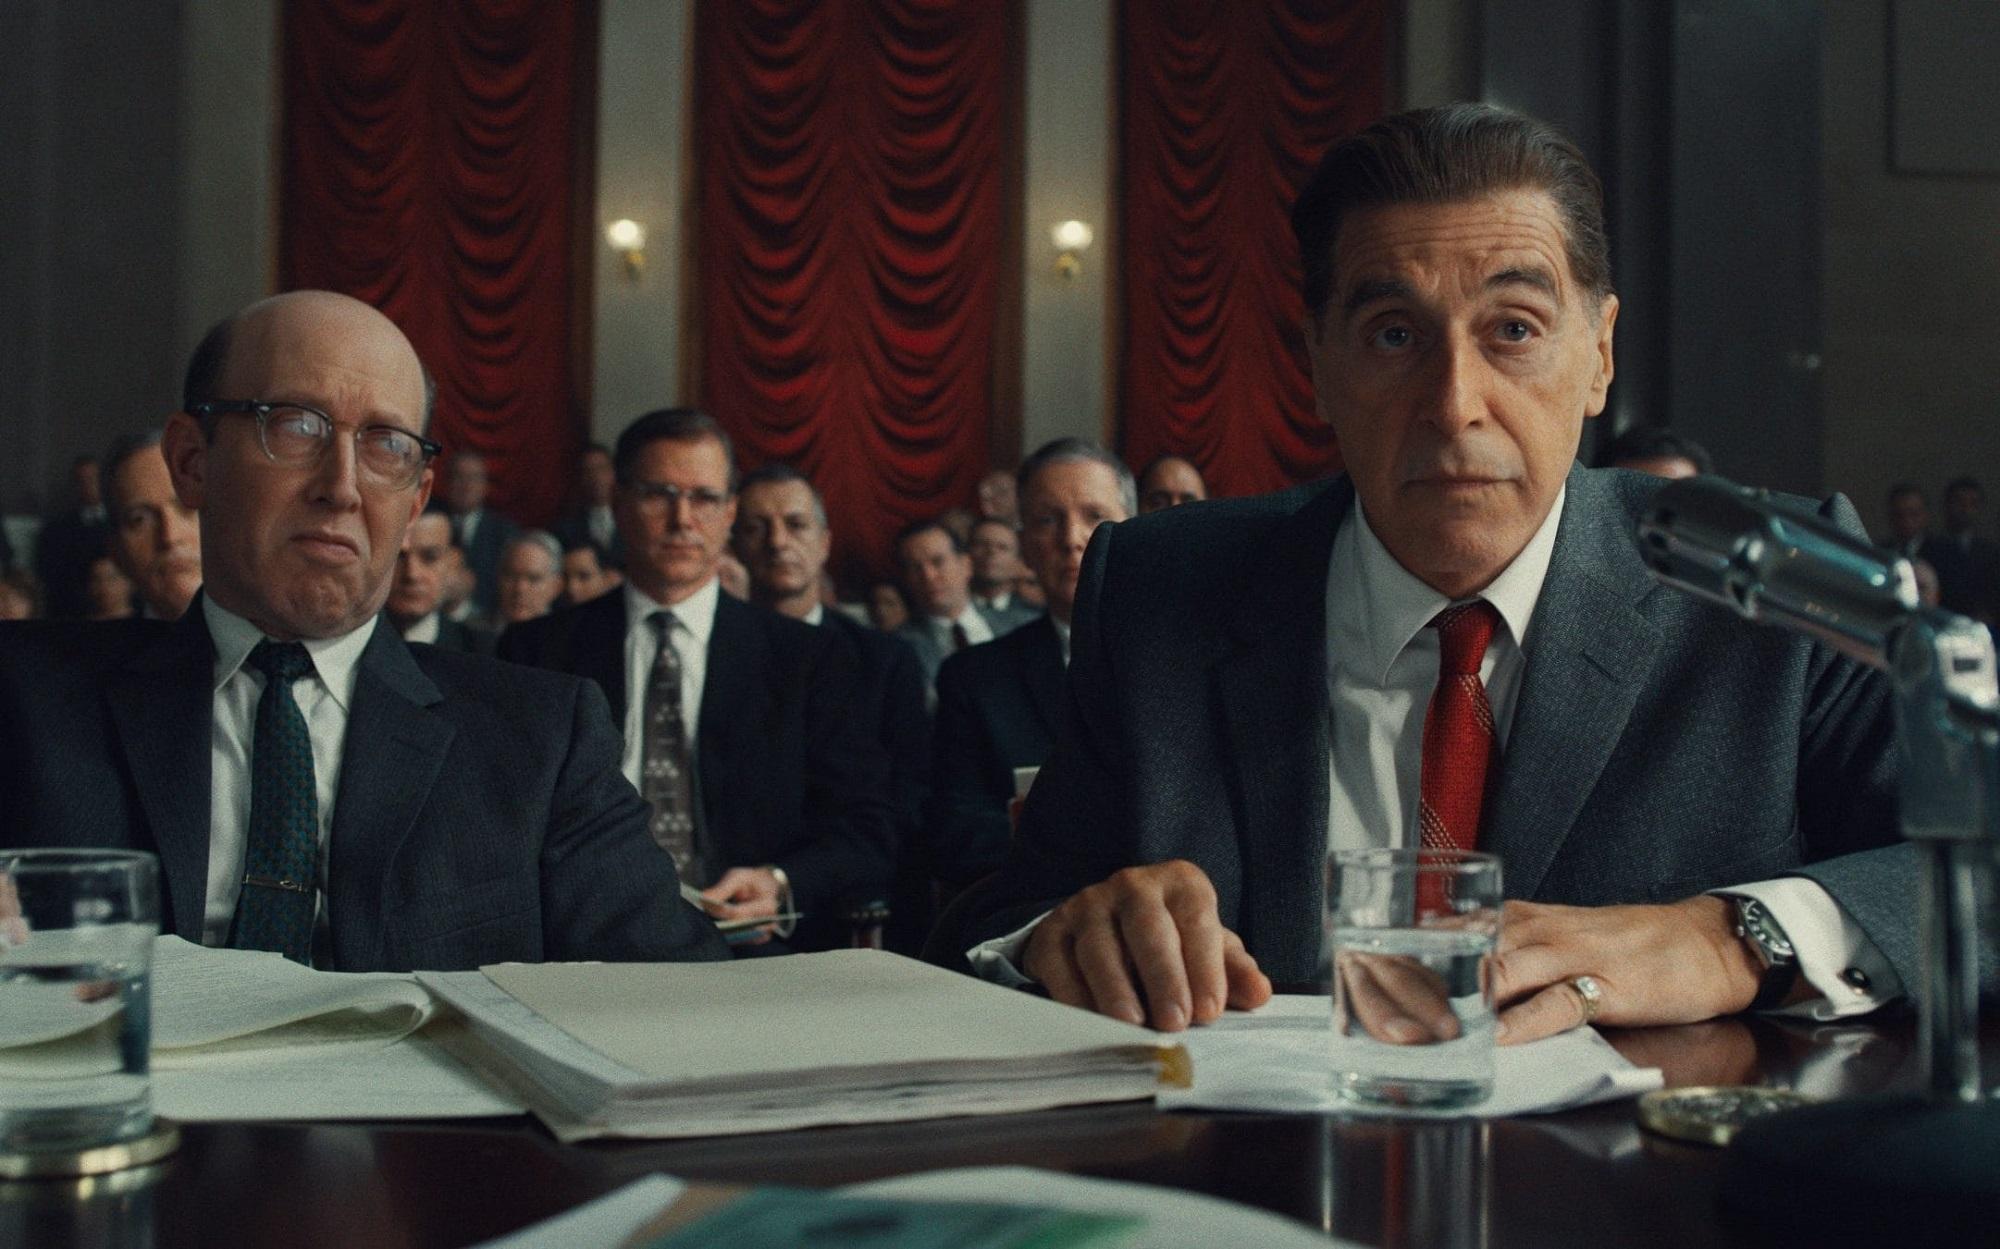 A still from the film The Irishman